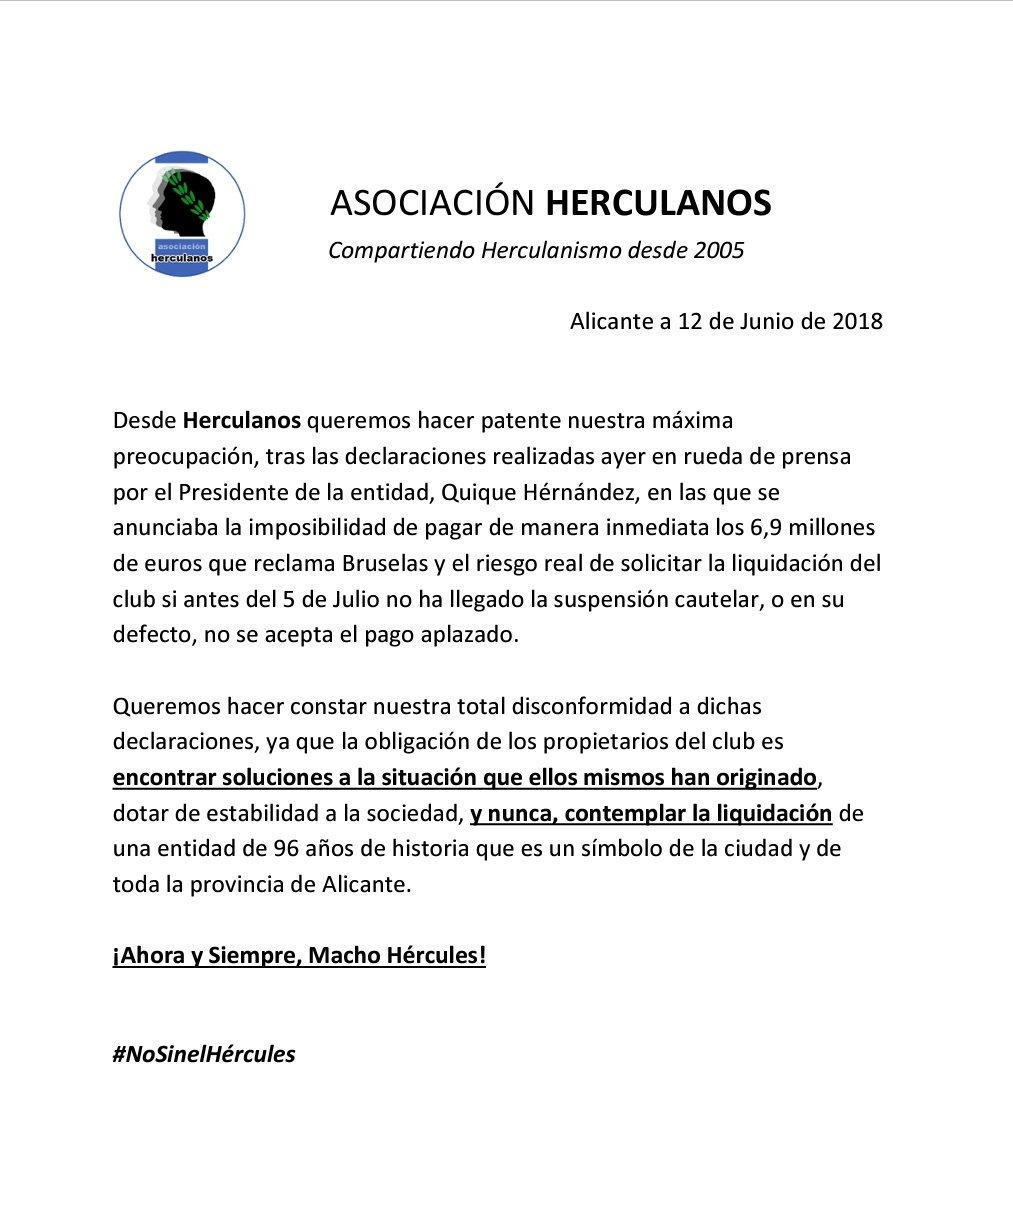 Herculanos